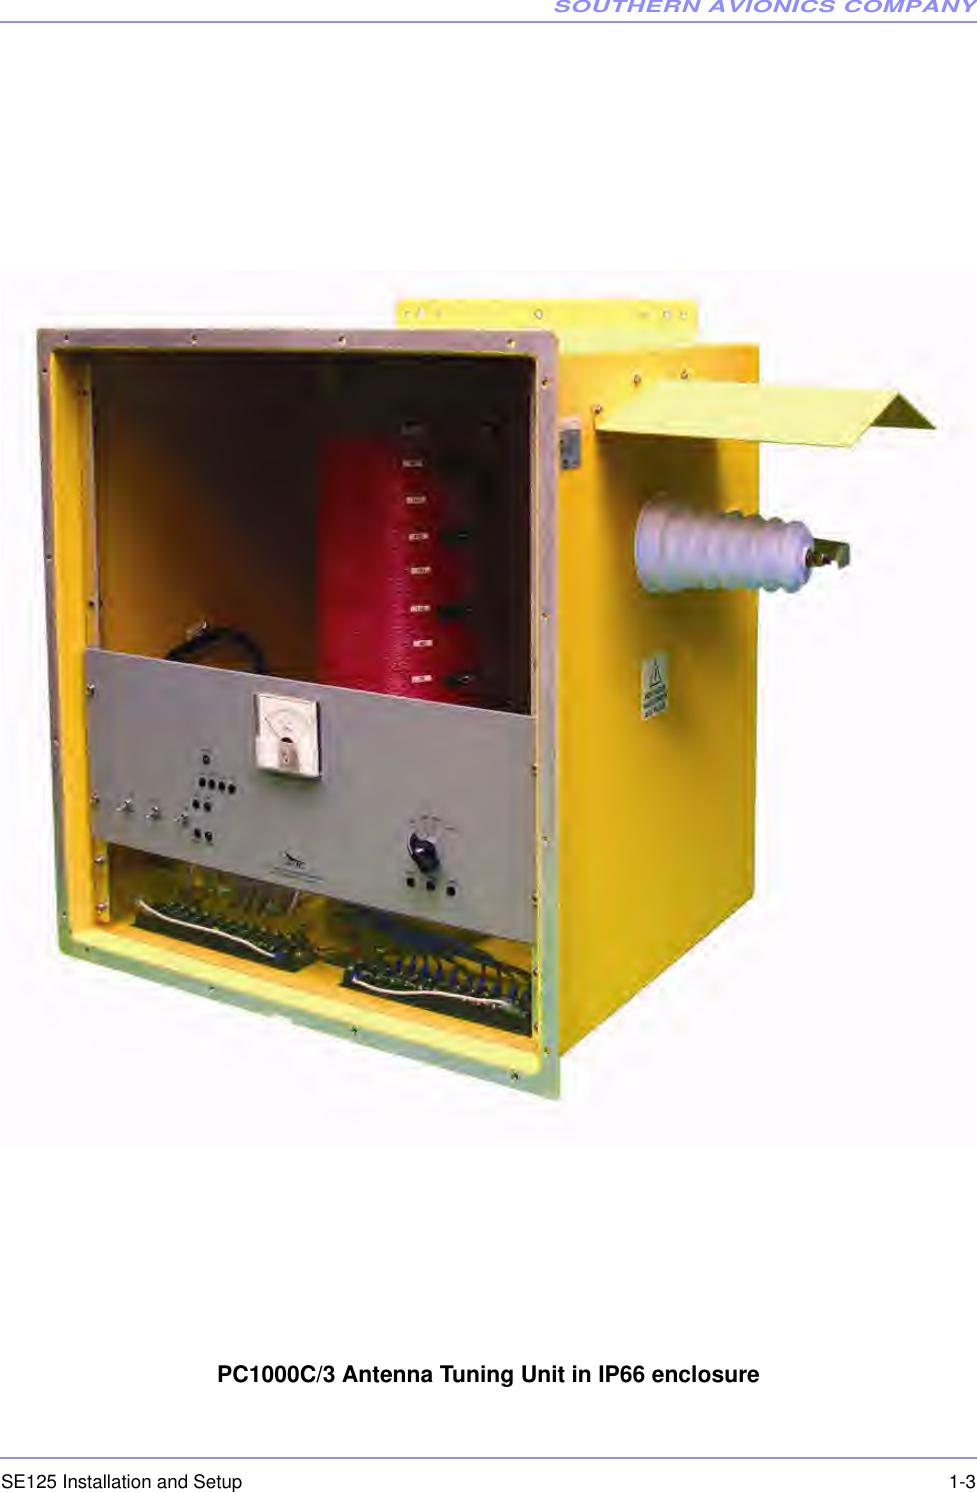 Southern Avionics Se125 Non Directional Radio Beacon User Manual Se Antenna Tuning Unit Companyse125 Installation And Setup 1 3pc1000c 3 In Ip66